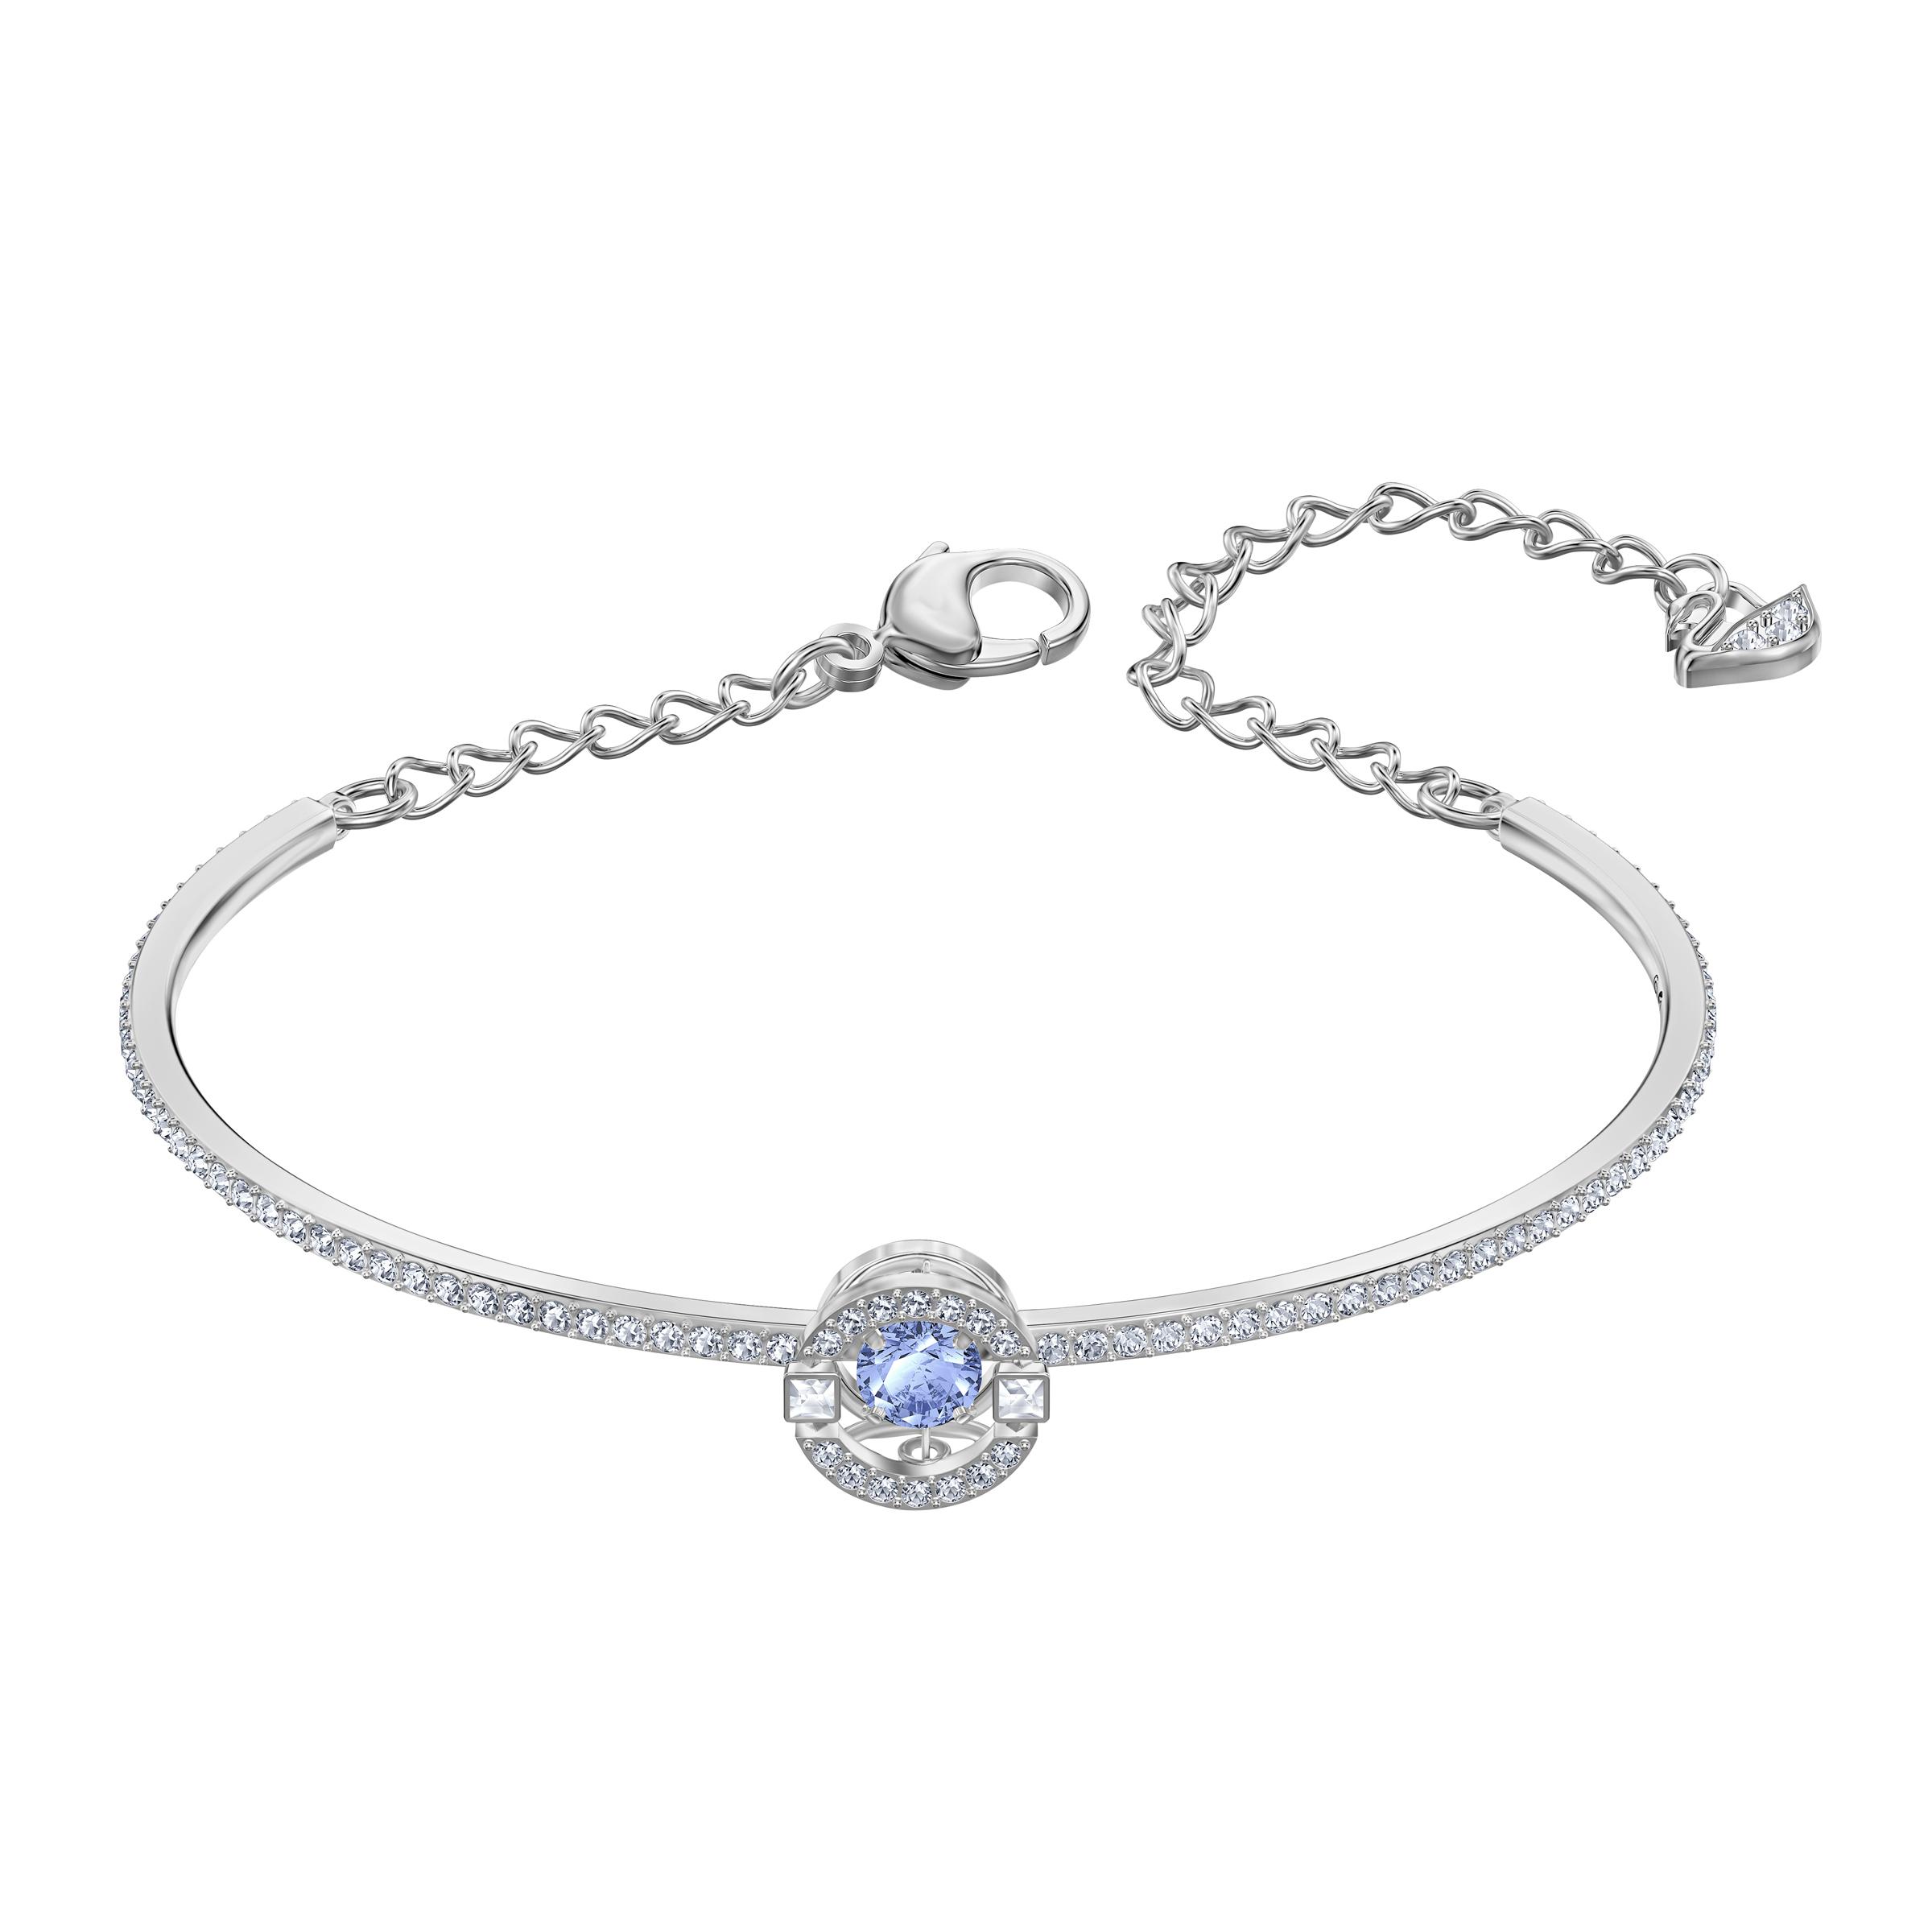 Bracelet-jonc Swarovski Sparkling Dance, bleu, Métal rhodié, Swarovski